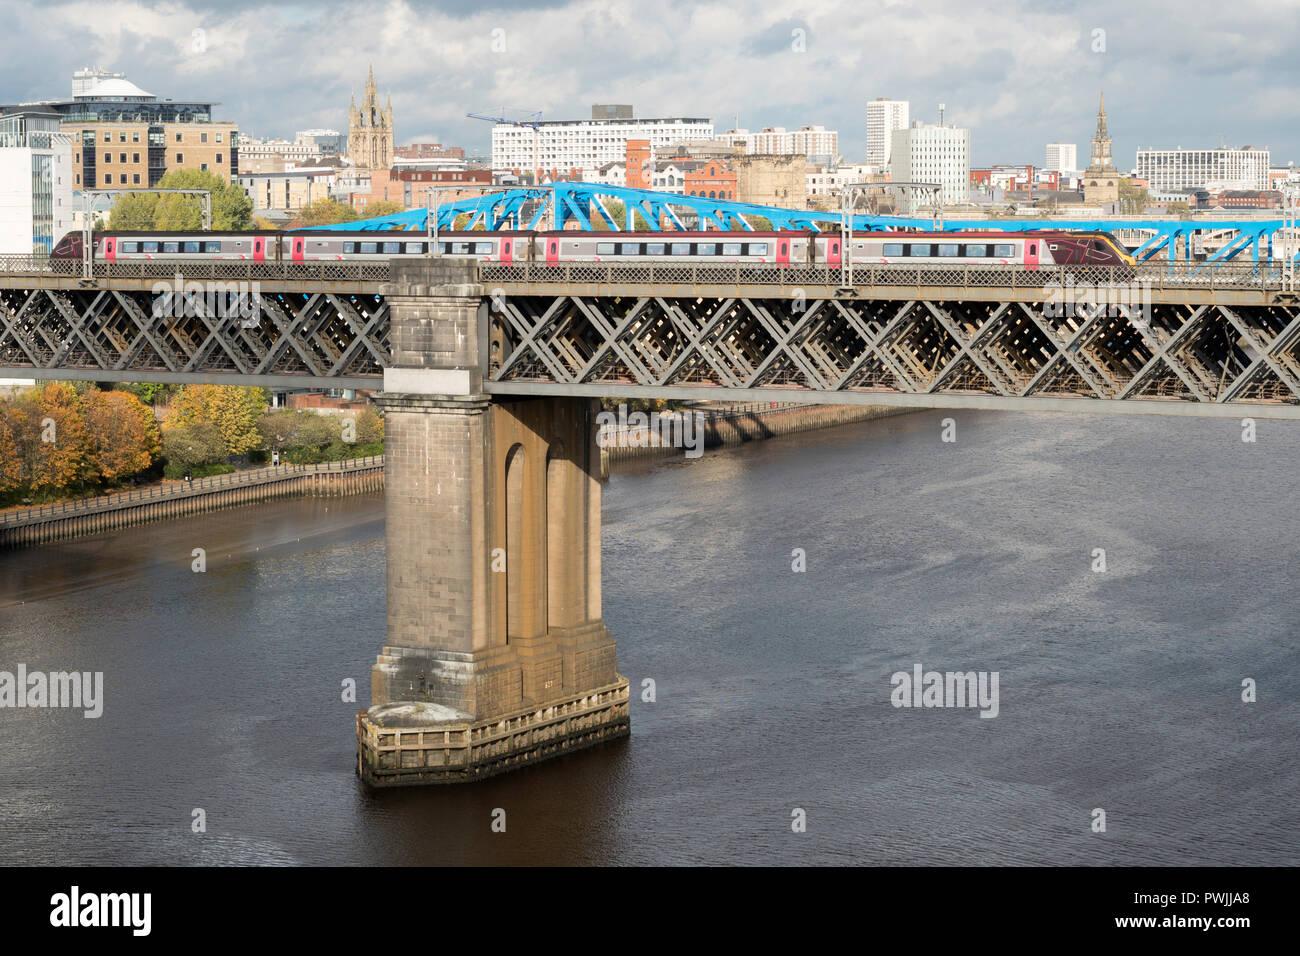 CrossCountry express passenger train crossing the King Edward Bridge over the river Tyne, Newcastle upon Tyne, England, UK - Stock Image